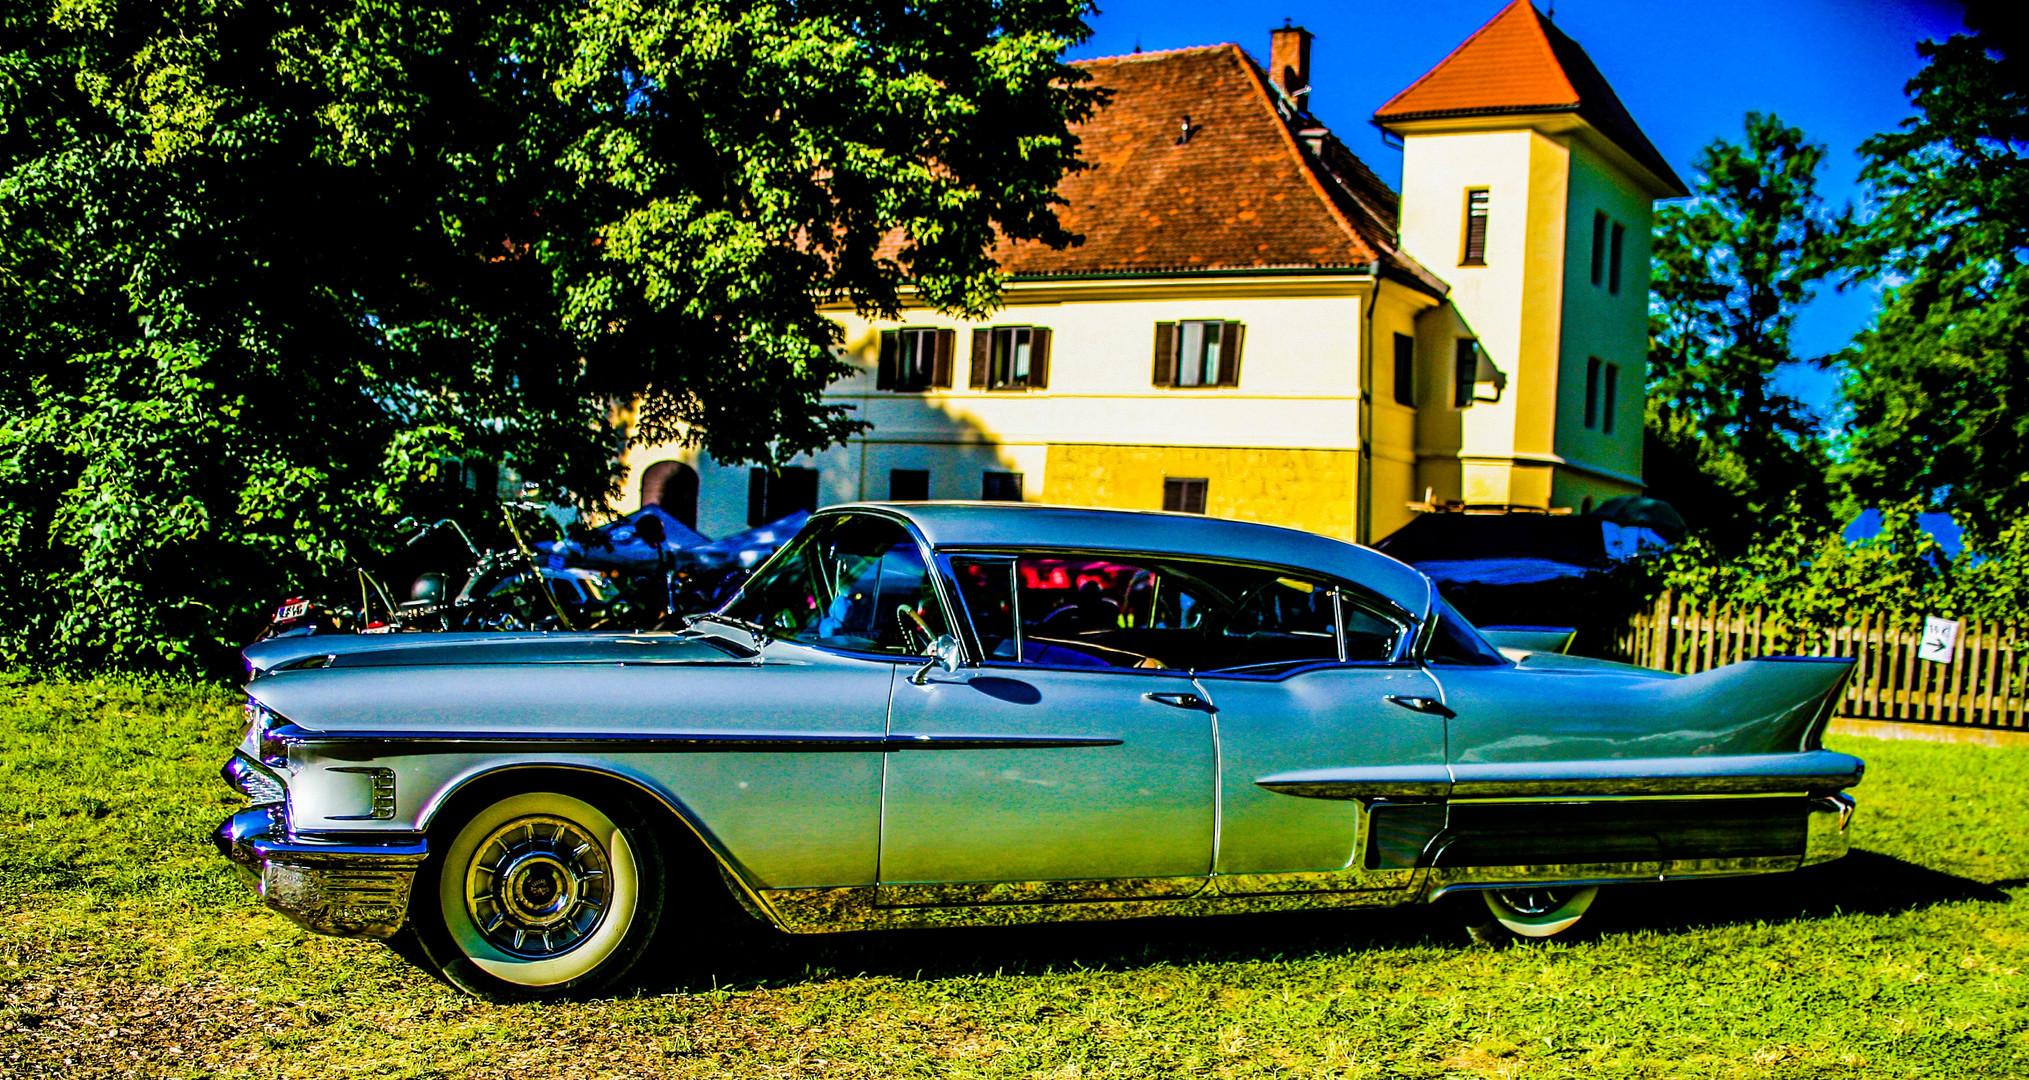 cadillac fleetwood foto & bild | autos & zweiräder, oldtimer